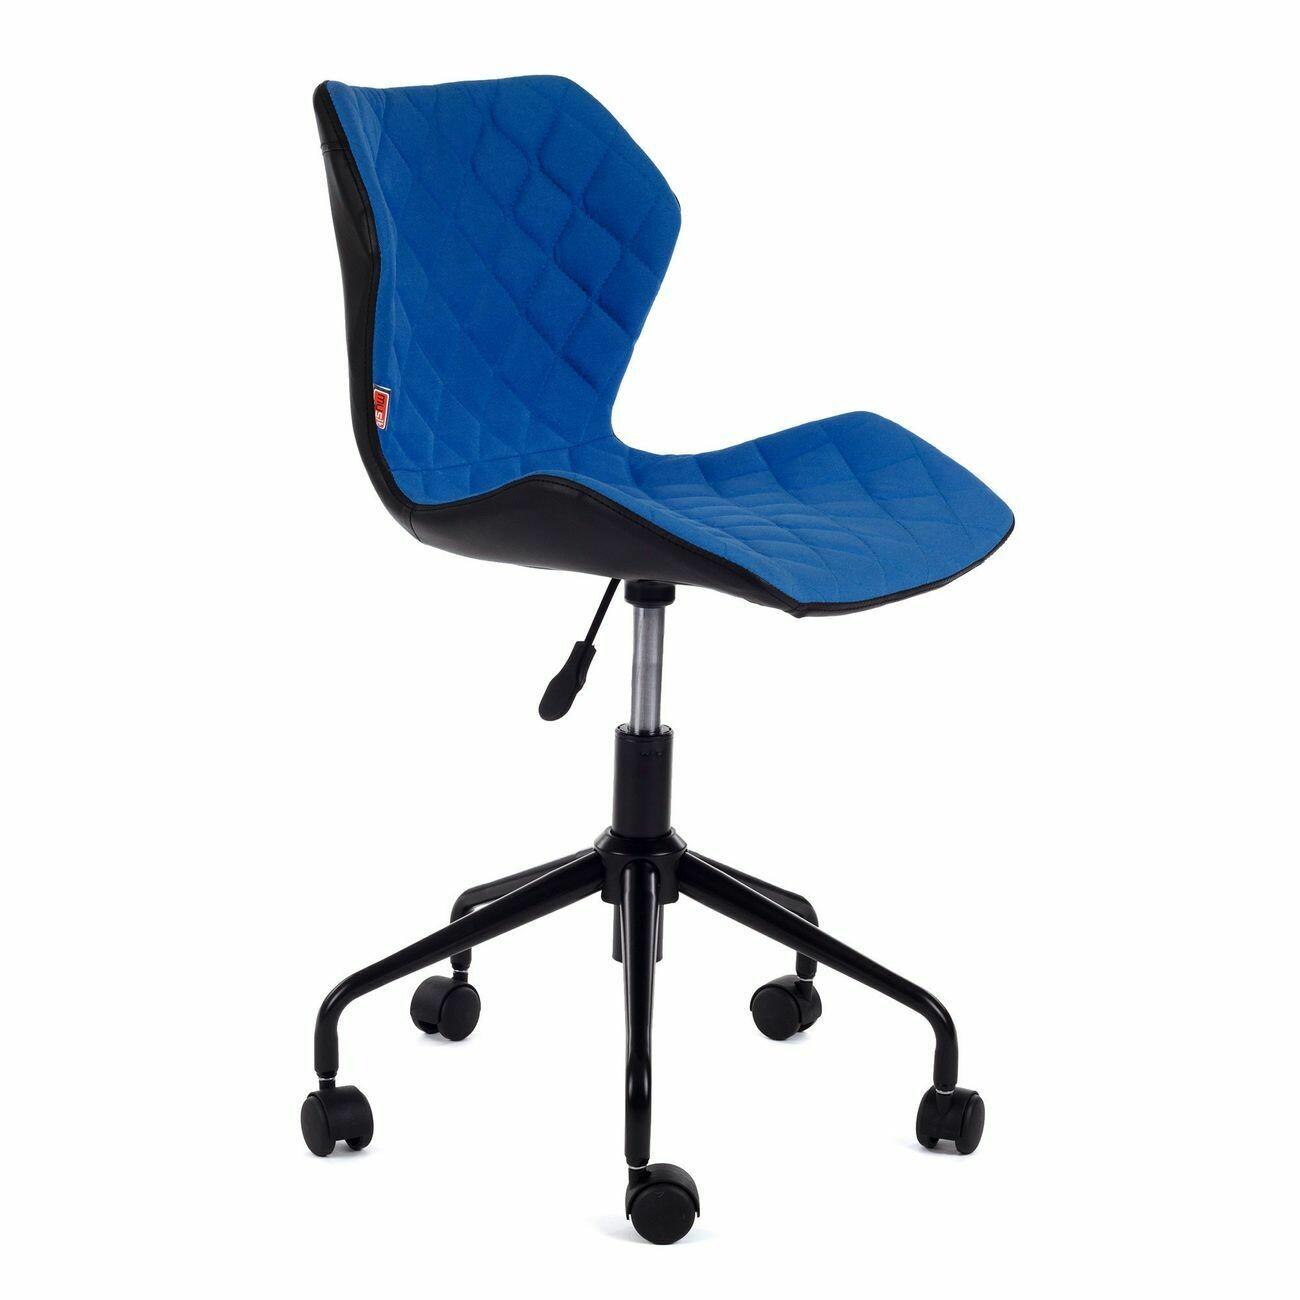 MY SIT Bürostuhl Design-Hocker Drehstuhl Stuhl INO Blau/Schwarz